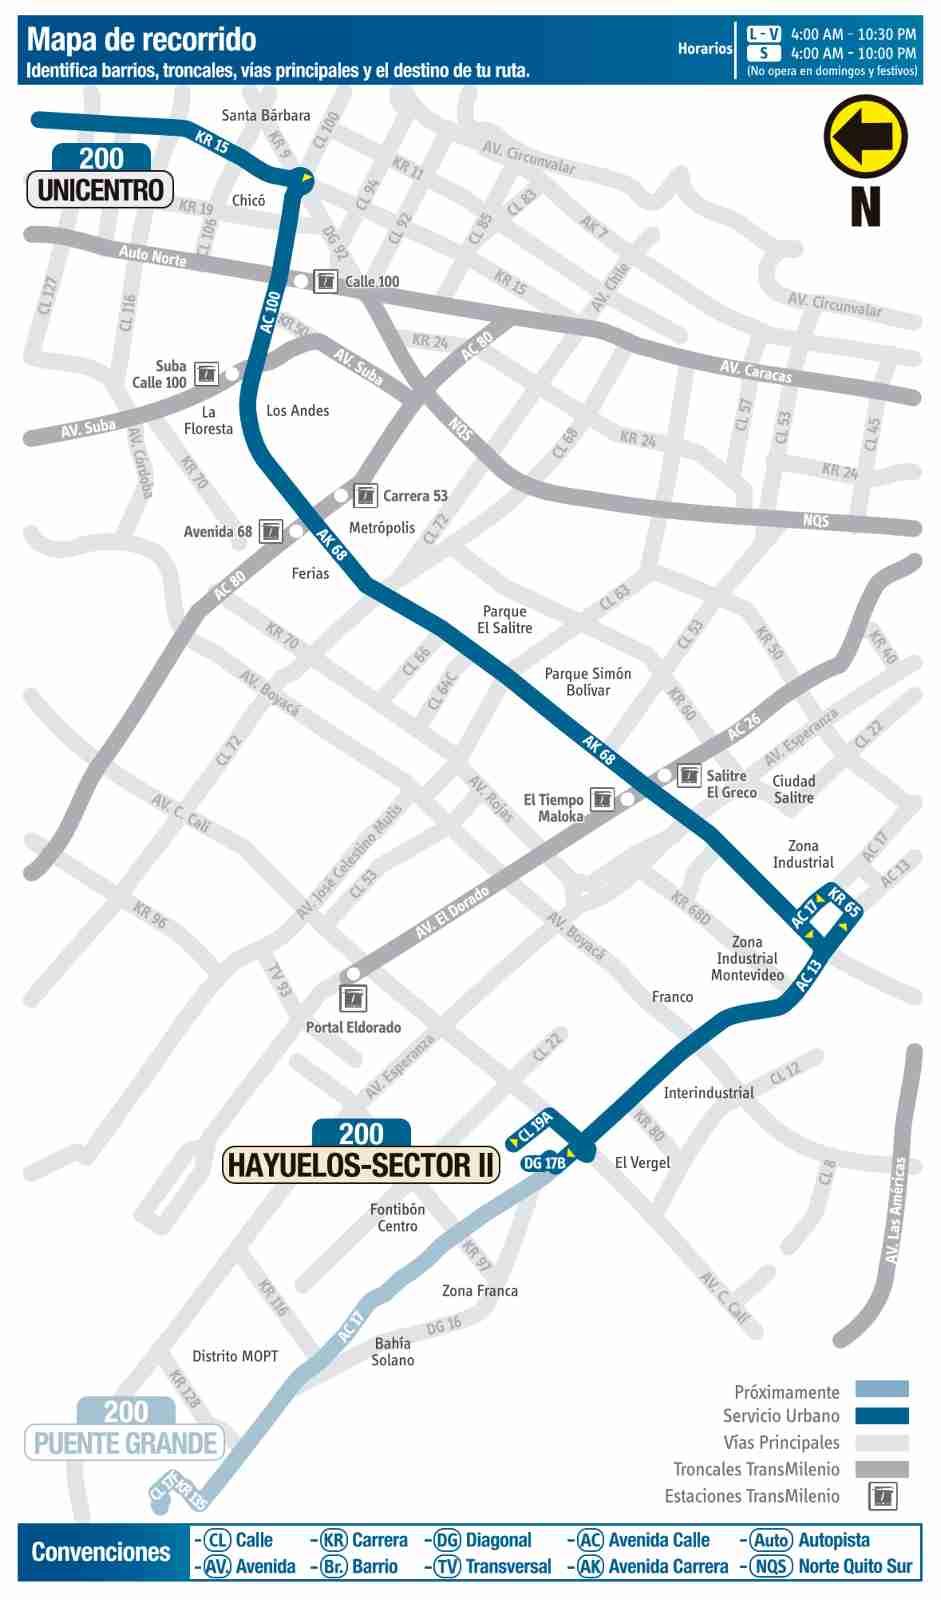 Ruta SITP: 200 Hayuelos Sector II ↔ Unicentro (mapa)